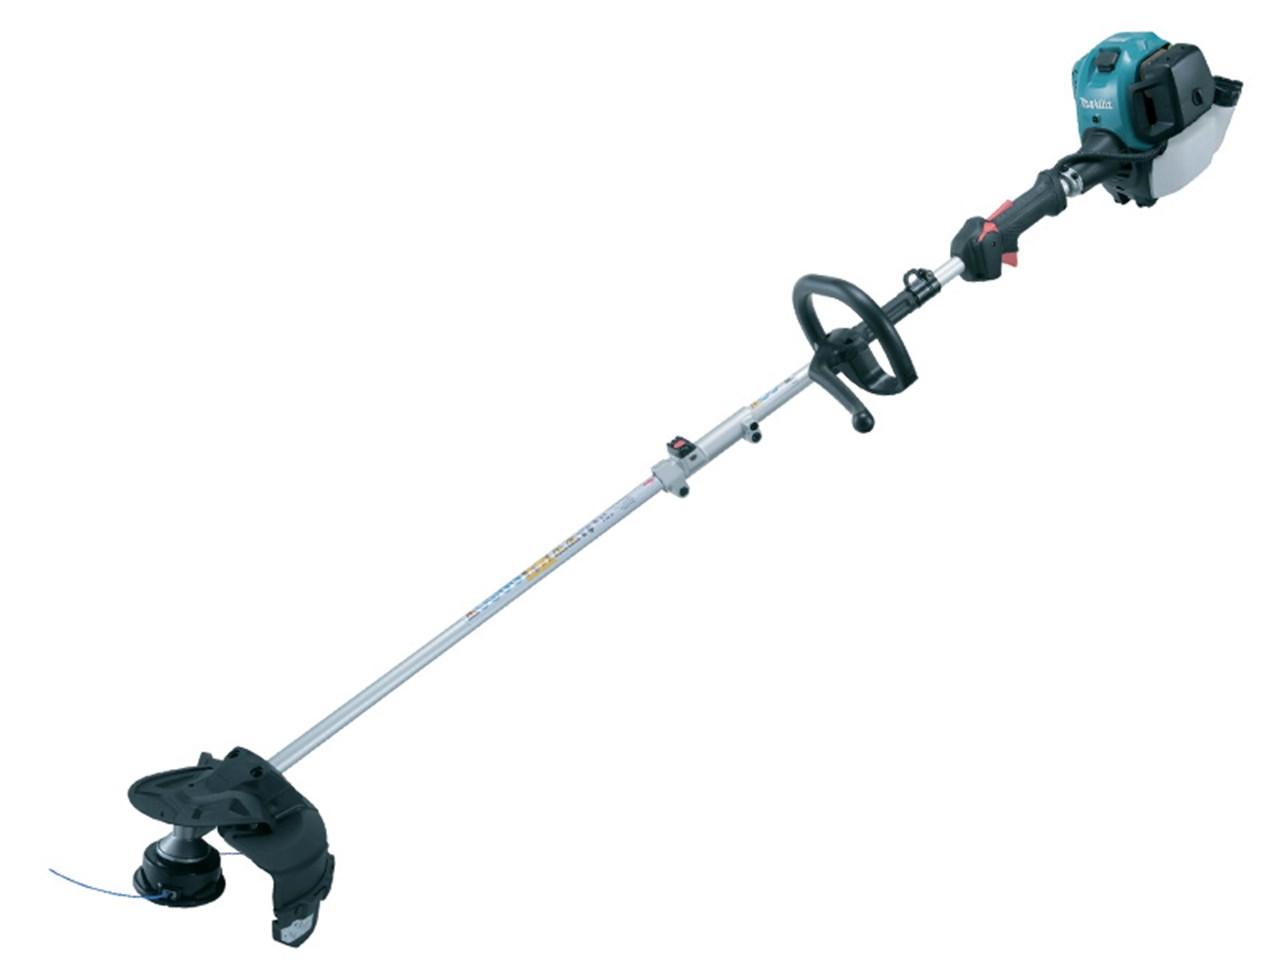 Spindle Shaft Rotary Cutter : Makita ex lhm cc split shaft brush cutter